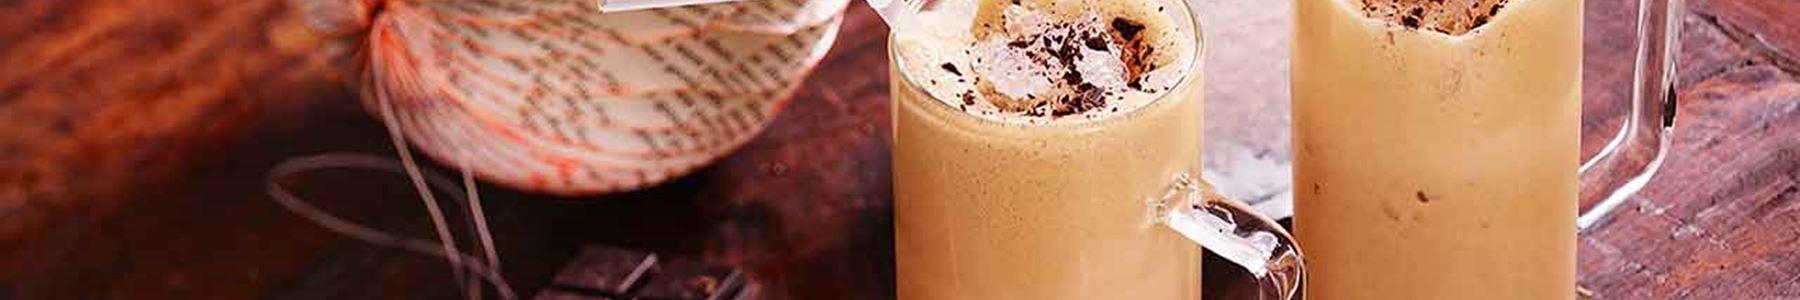 Snabb + Kalorisnål + Choklad + Glass